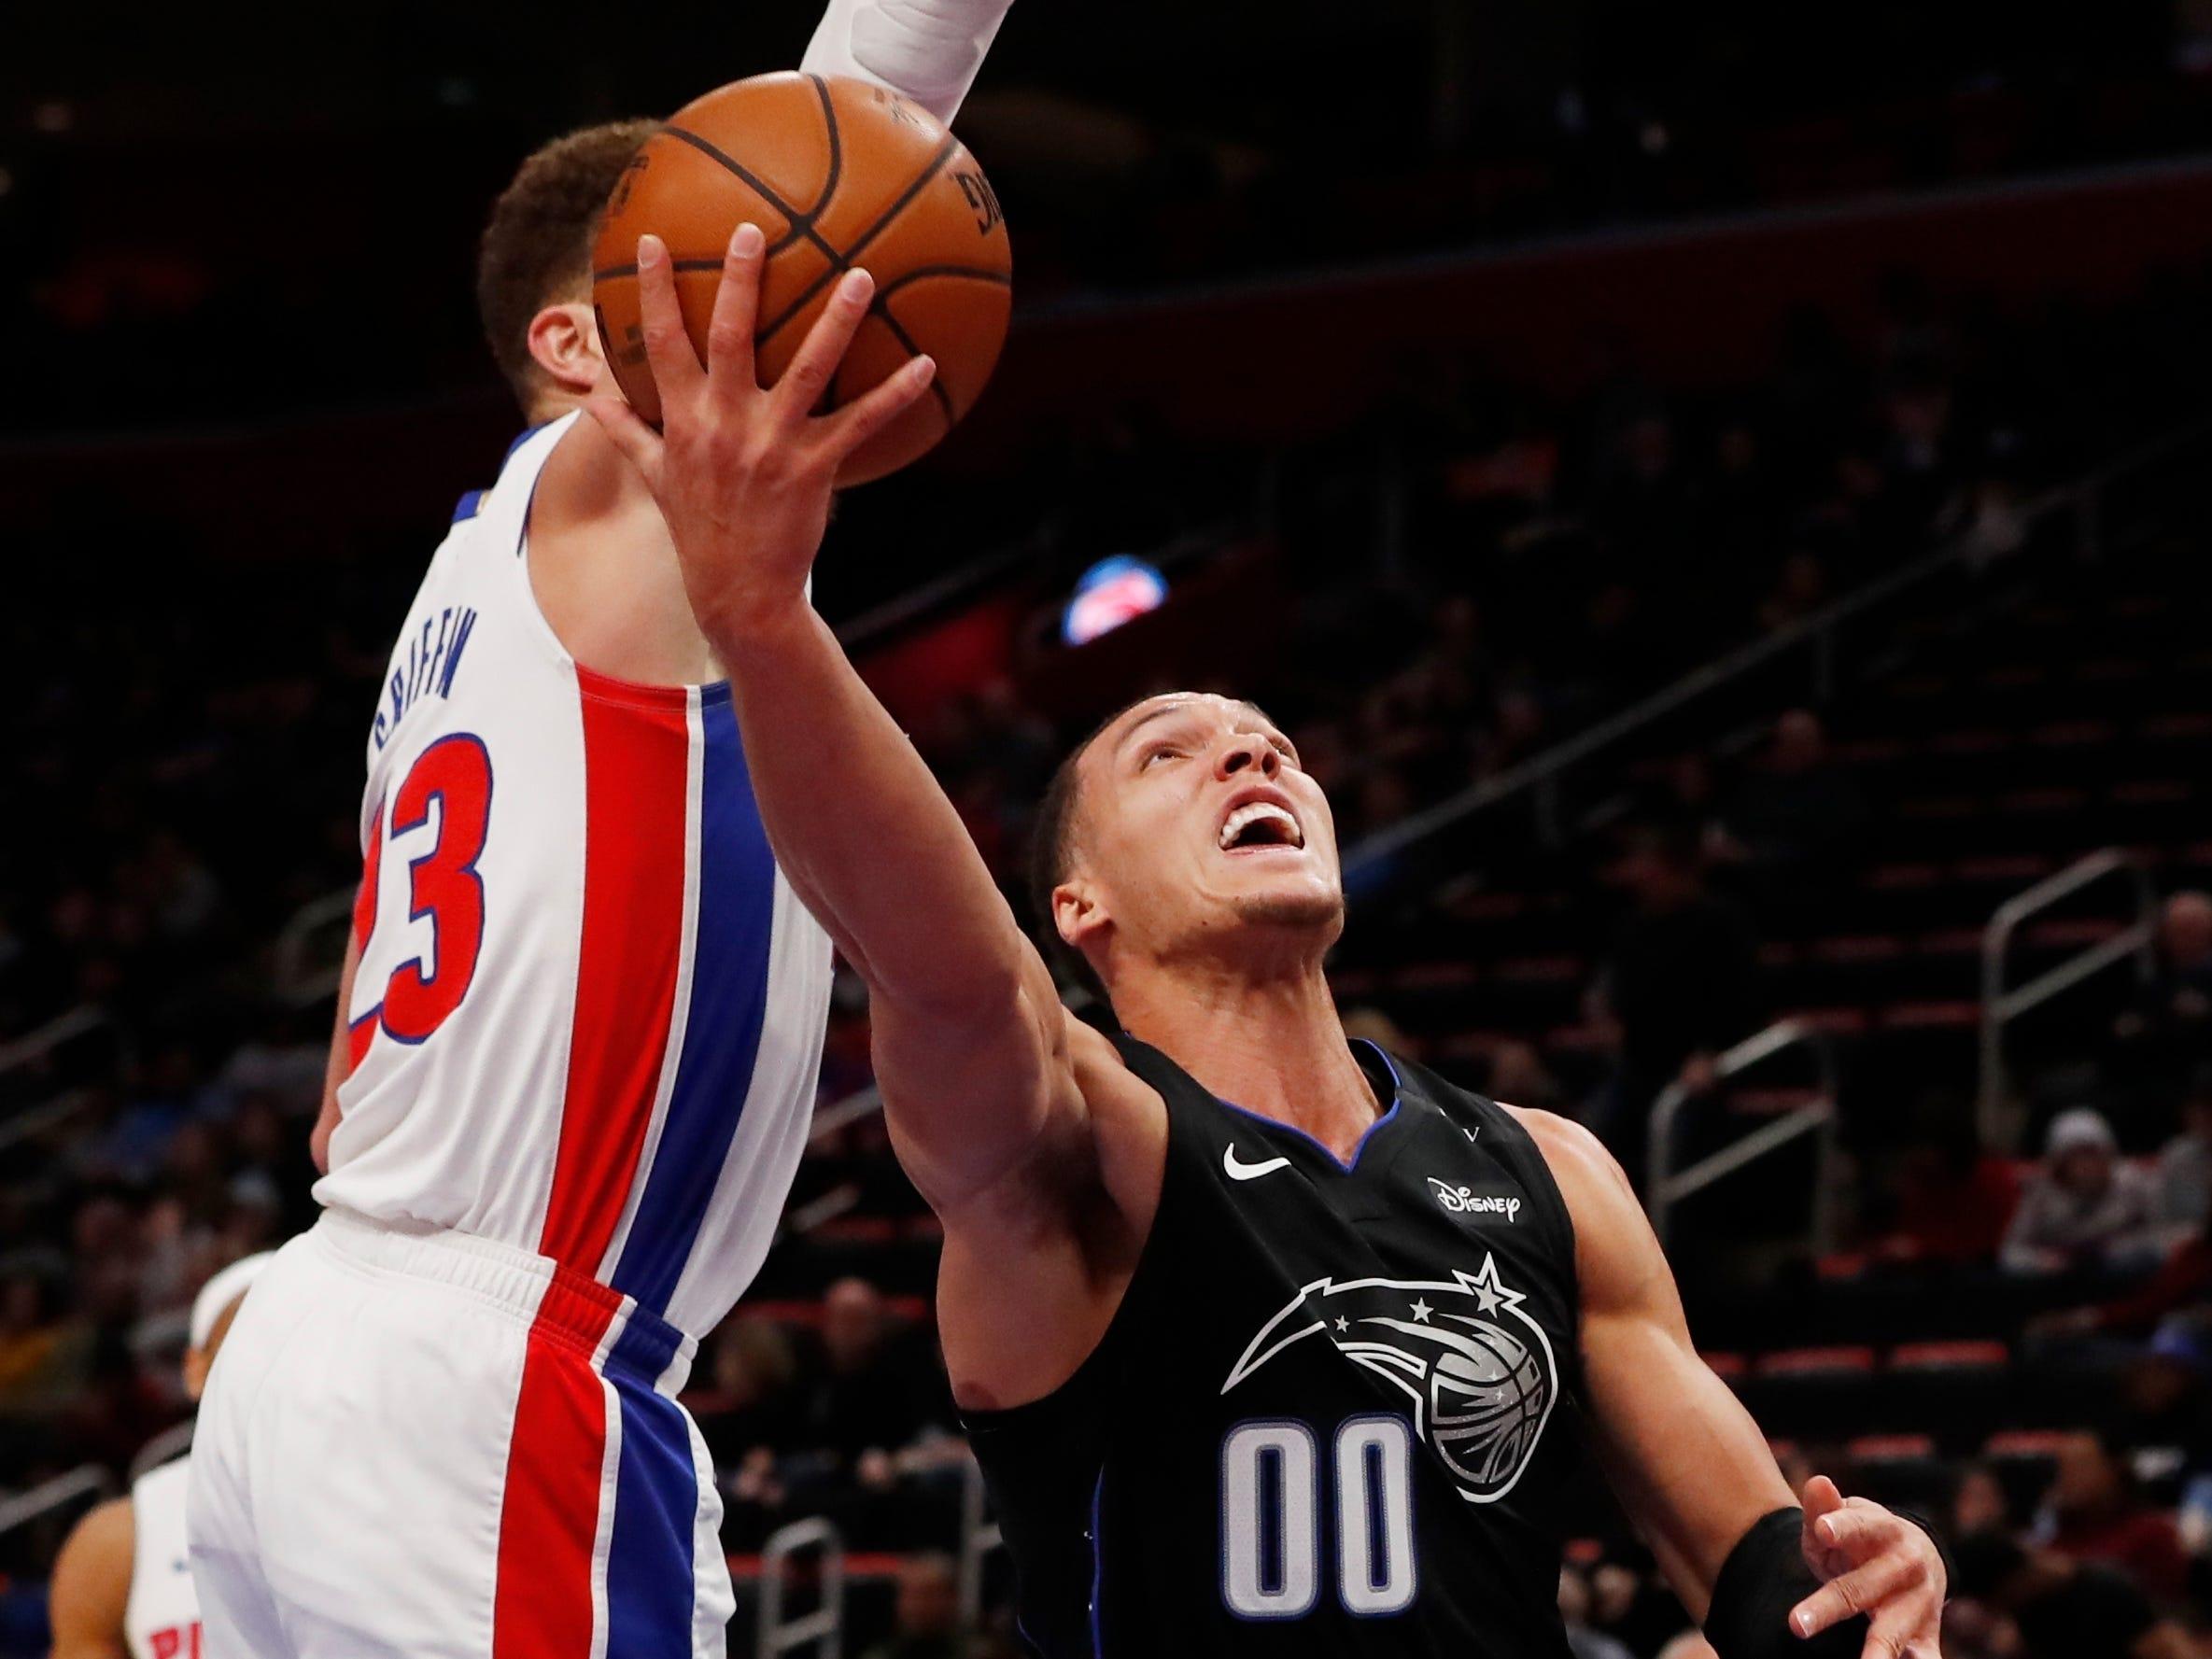 Orlando Magic forward Aaron Gordon (00) shoots as Detroit Pistons forward Blake Griffin (23) defends during the second half.